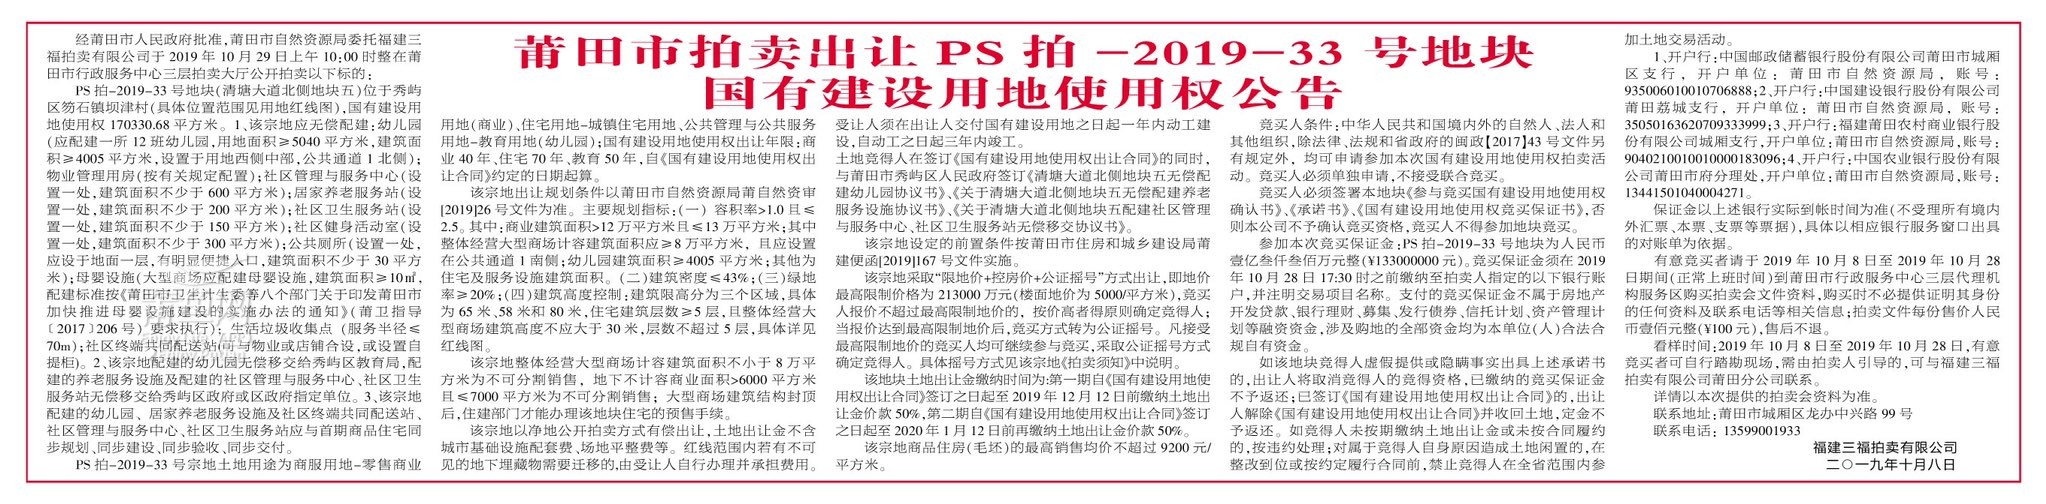 PS 拍-2019-34 号地块(火车站站前片区 3# 地块)